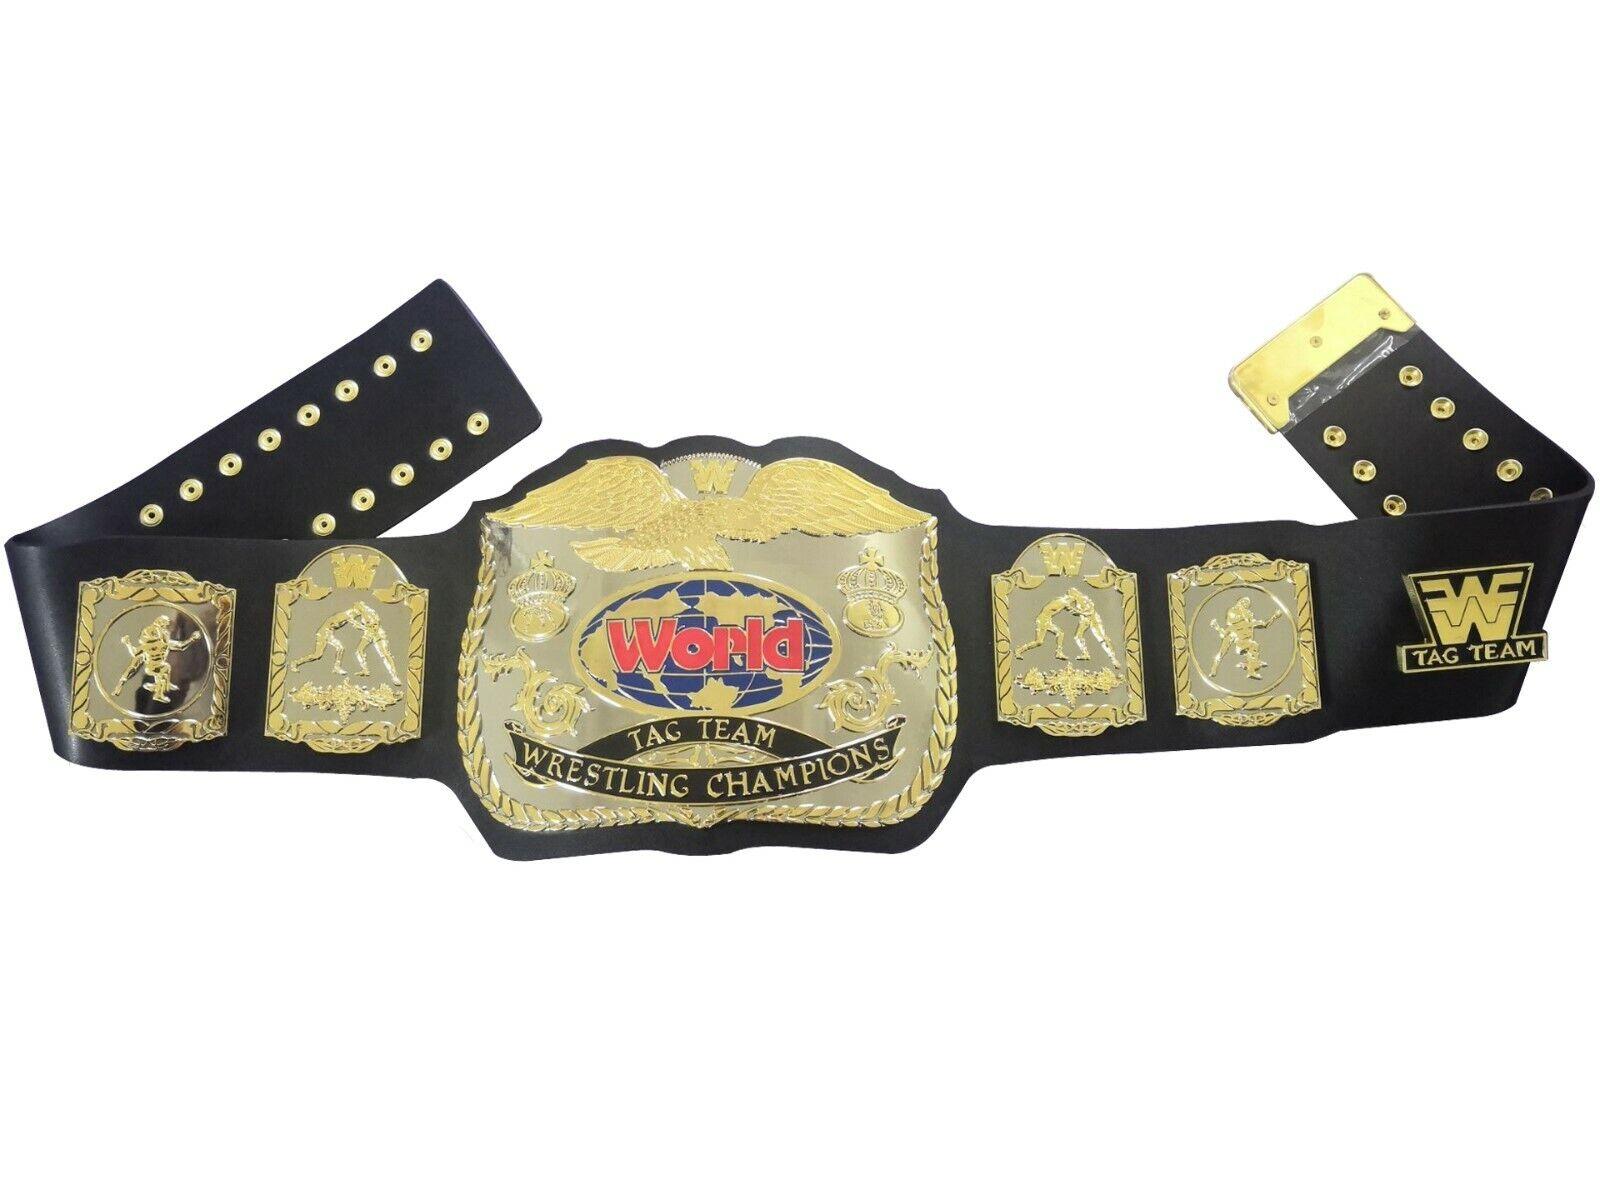 2019 Newest  World World World TAG TEAM Wrestling Champions Belt Adult Size FWF DUAL PLATED ec29f0